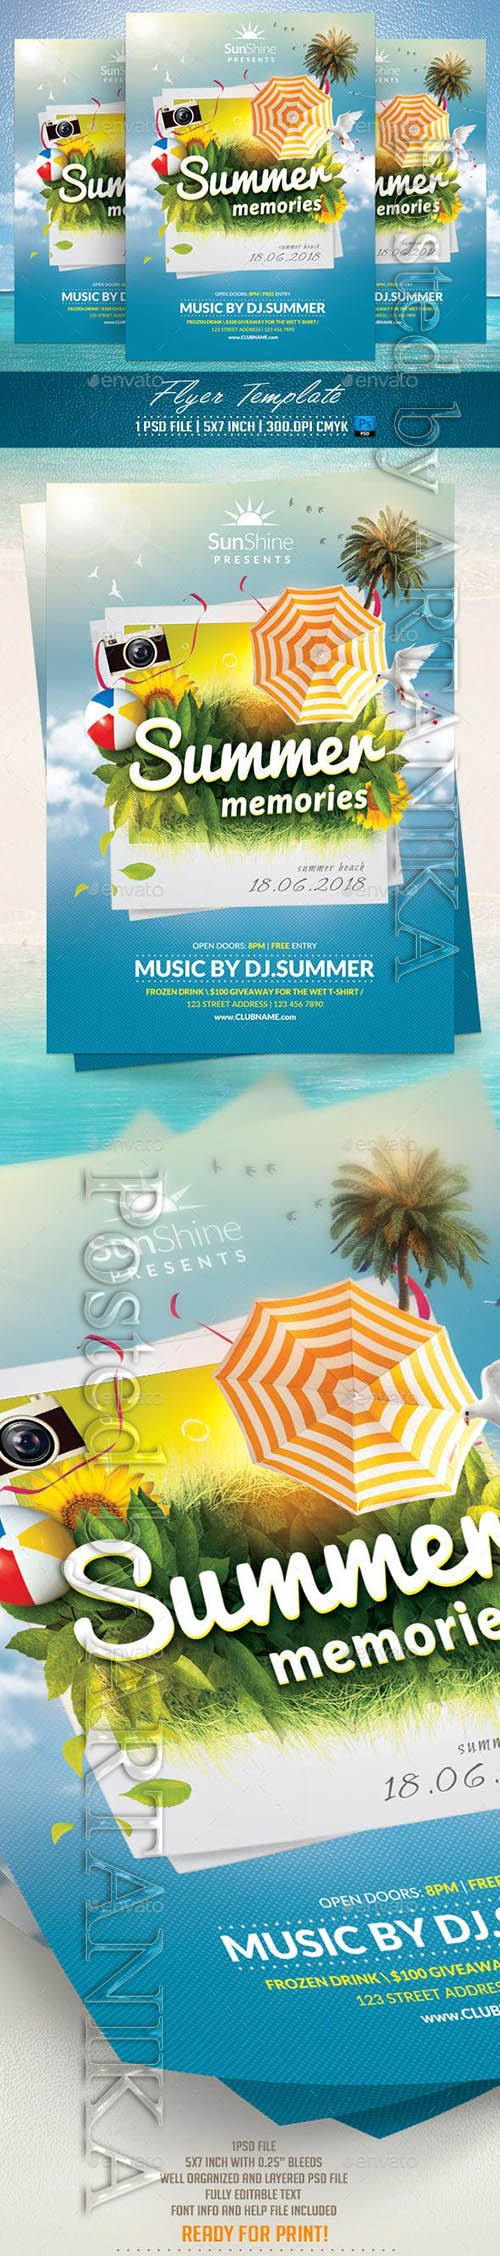 Summer Memories Flyer Template 11830756